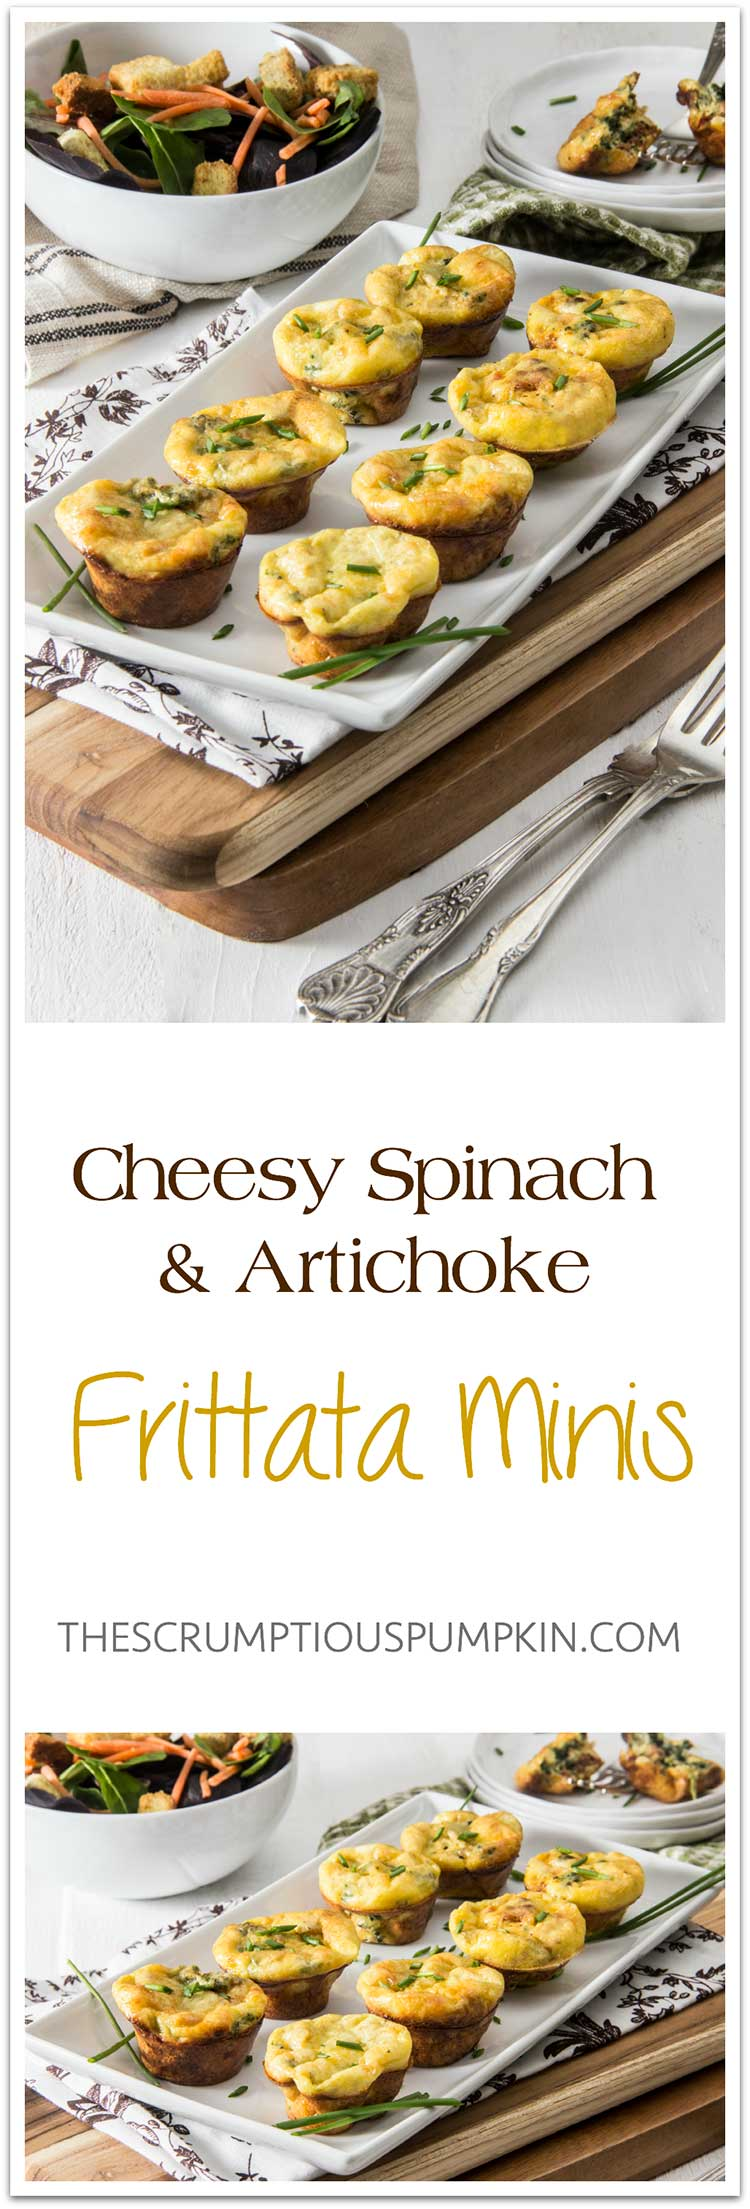 Cheesy-Spinach-and-Artichoke-Frittata-Minis